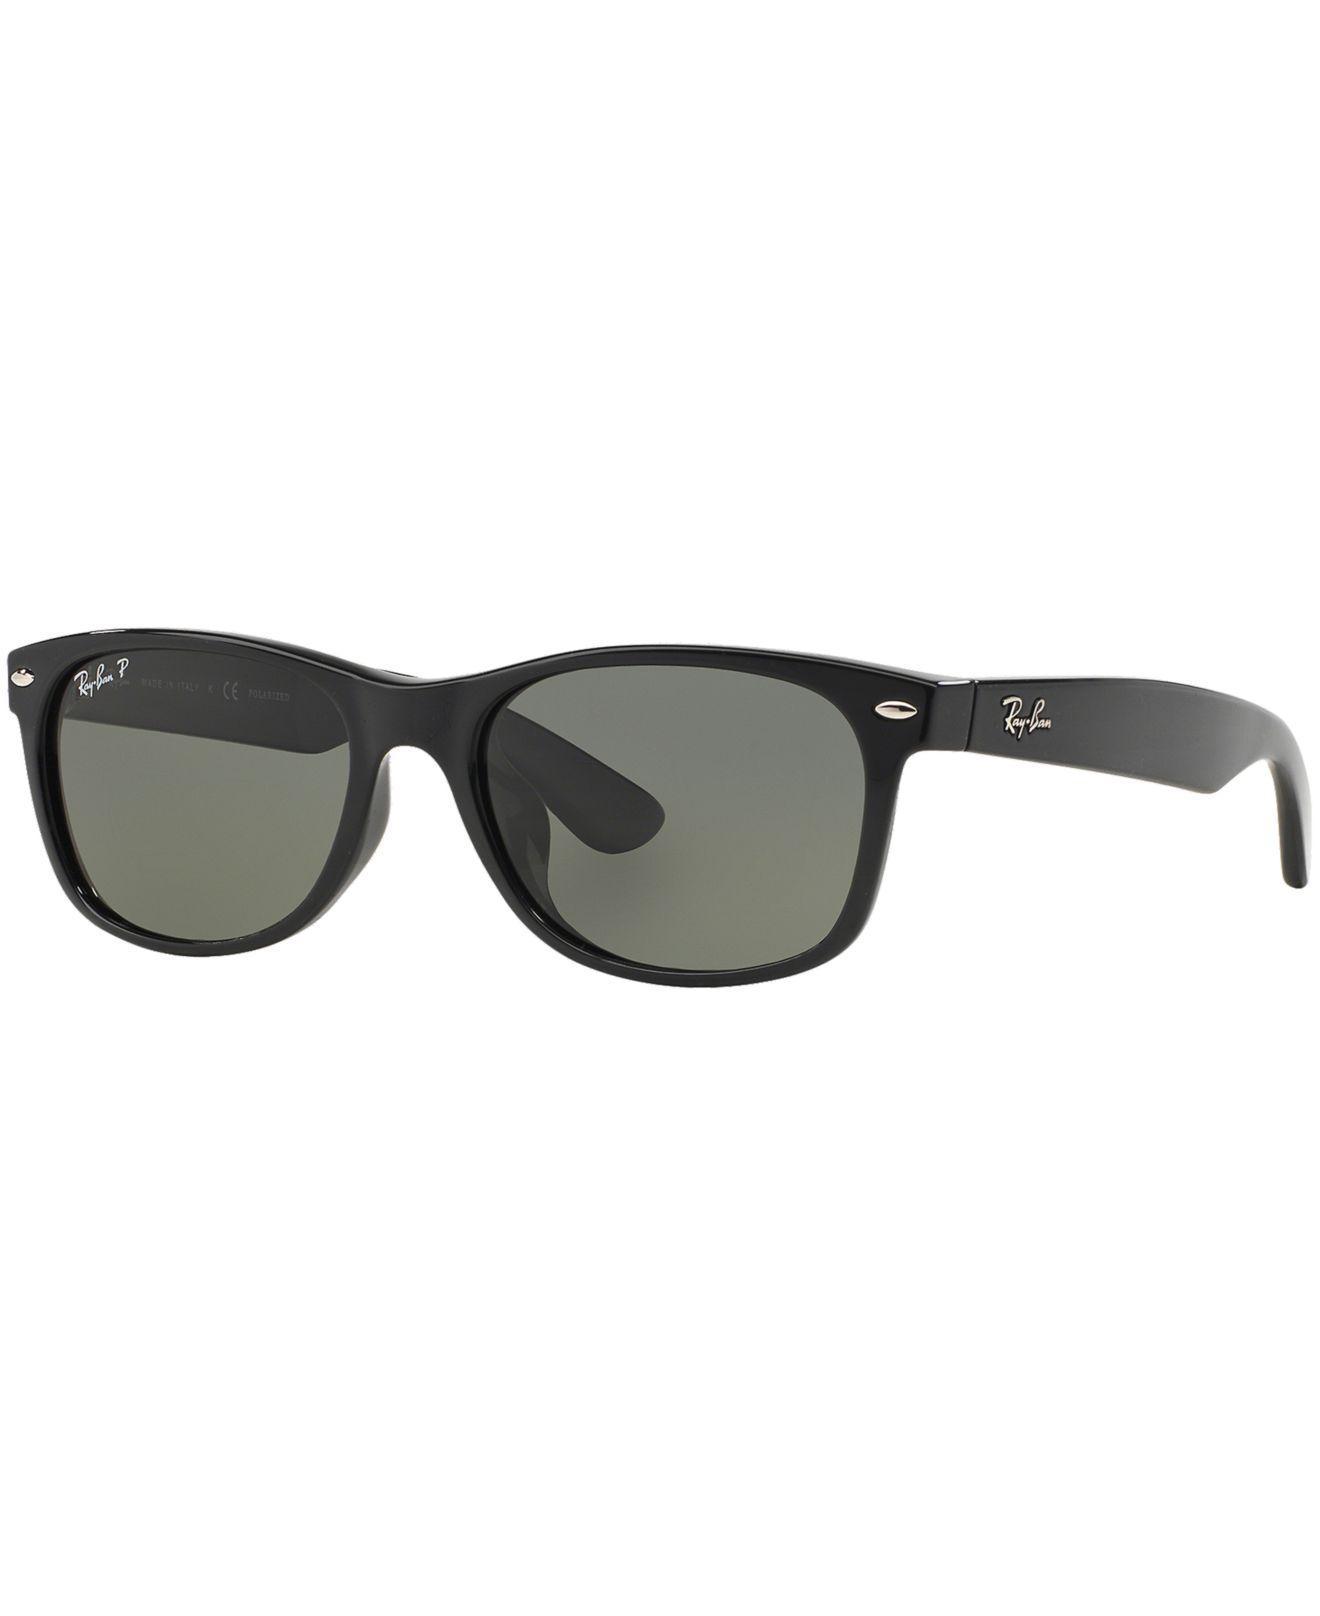 c746e942f9fc5 Ray-Ban. Men s Black Polarized Sunglasses